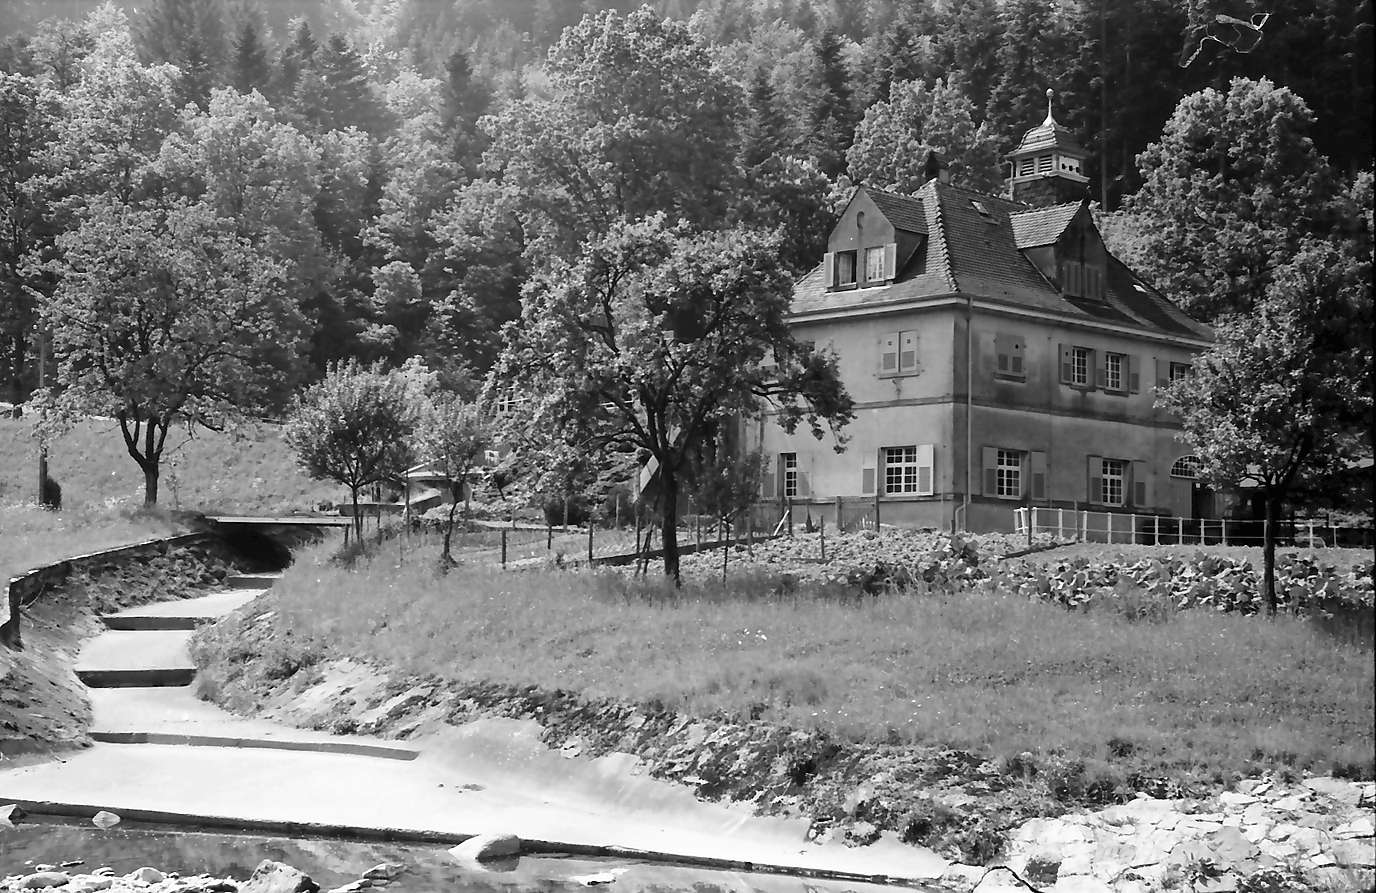 Lautenbach: Kraftstation der Köhler Papierfabrik, Bild 1